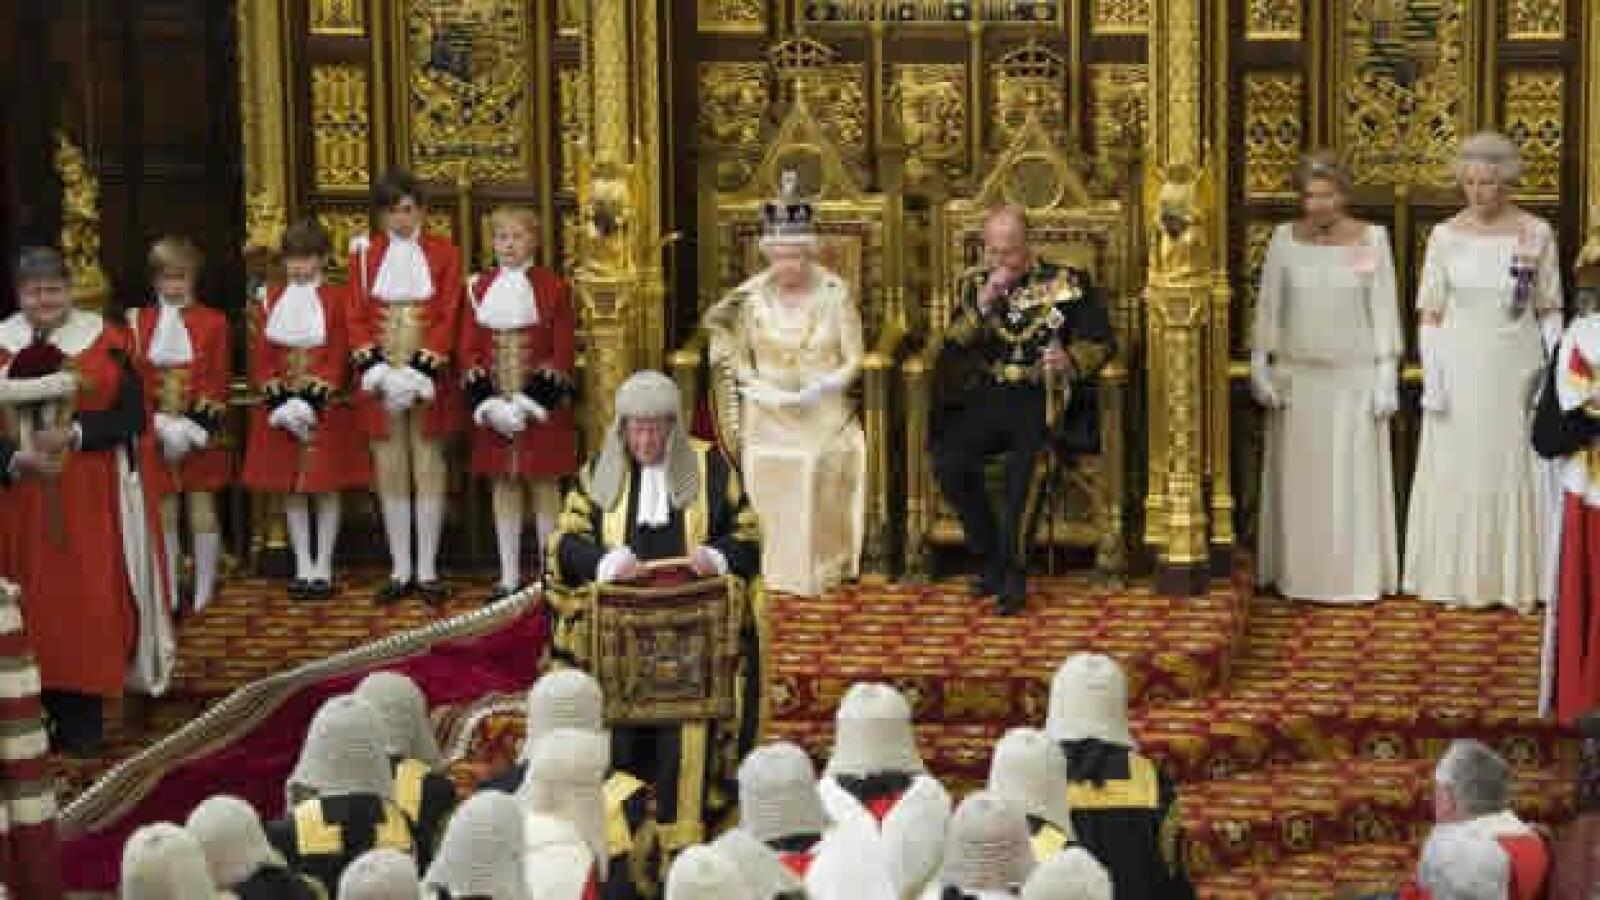 apertura parlamento britanico reina isabel discurso